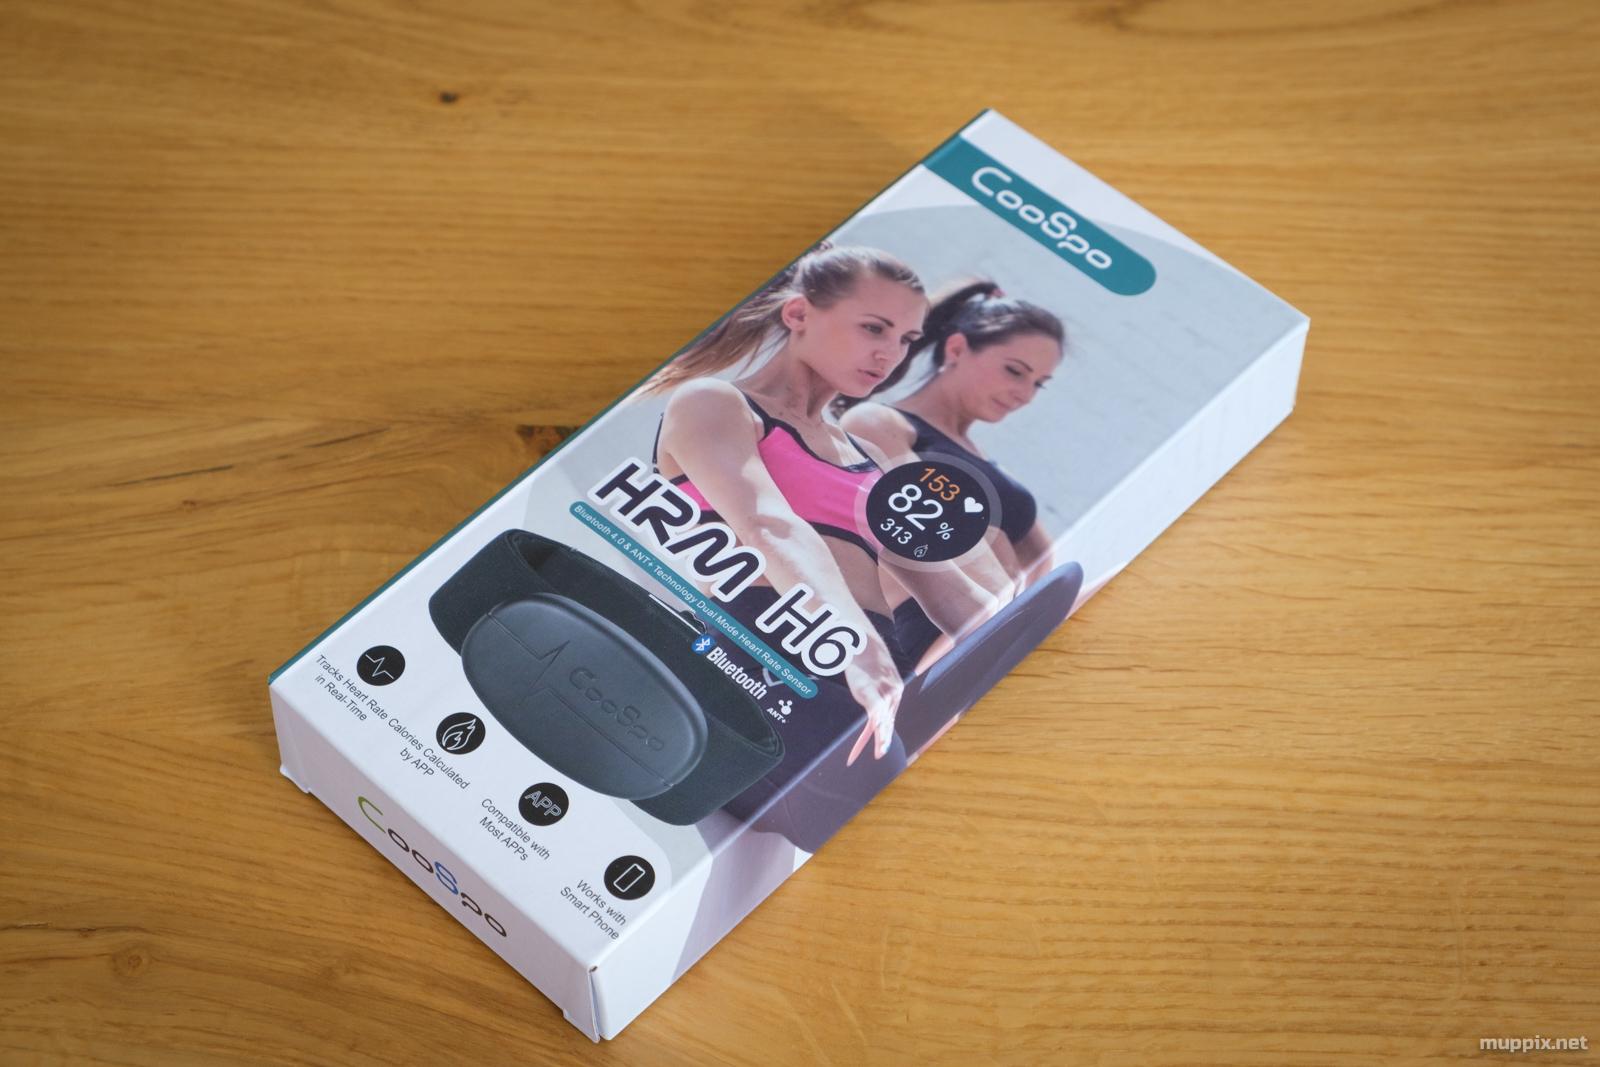 CooSpo HRM 808S Heart Rate Sensor Bluetooth,***